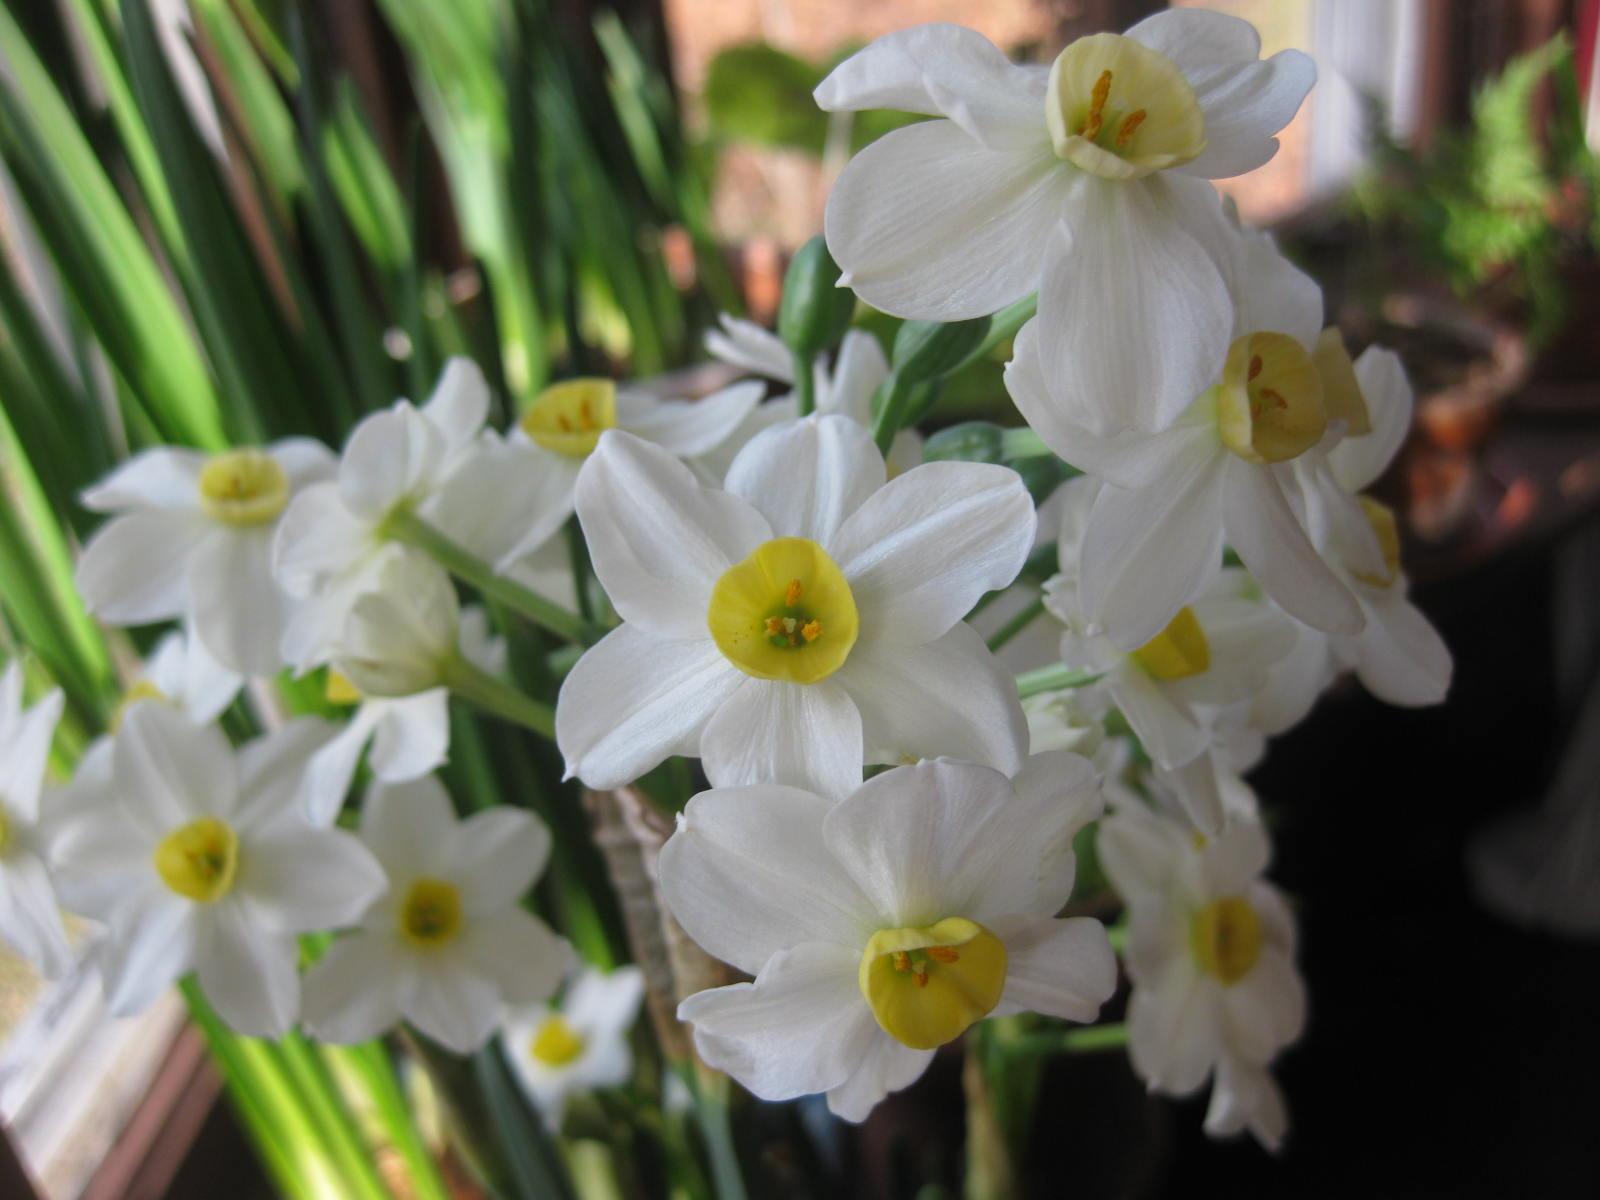 Narcissus 'Winter Sun'